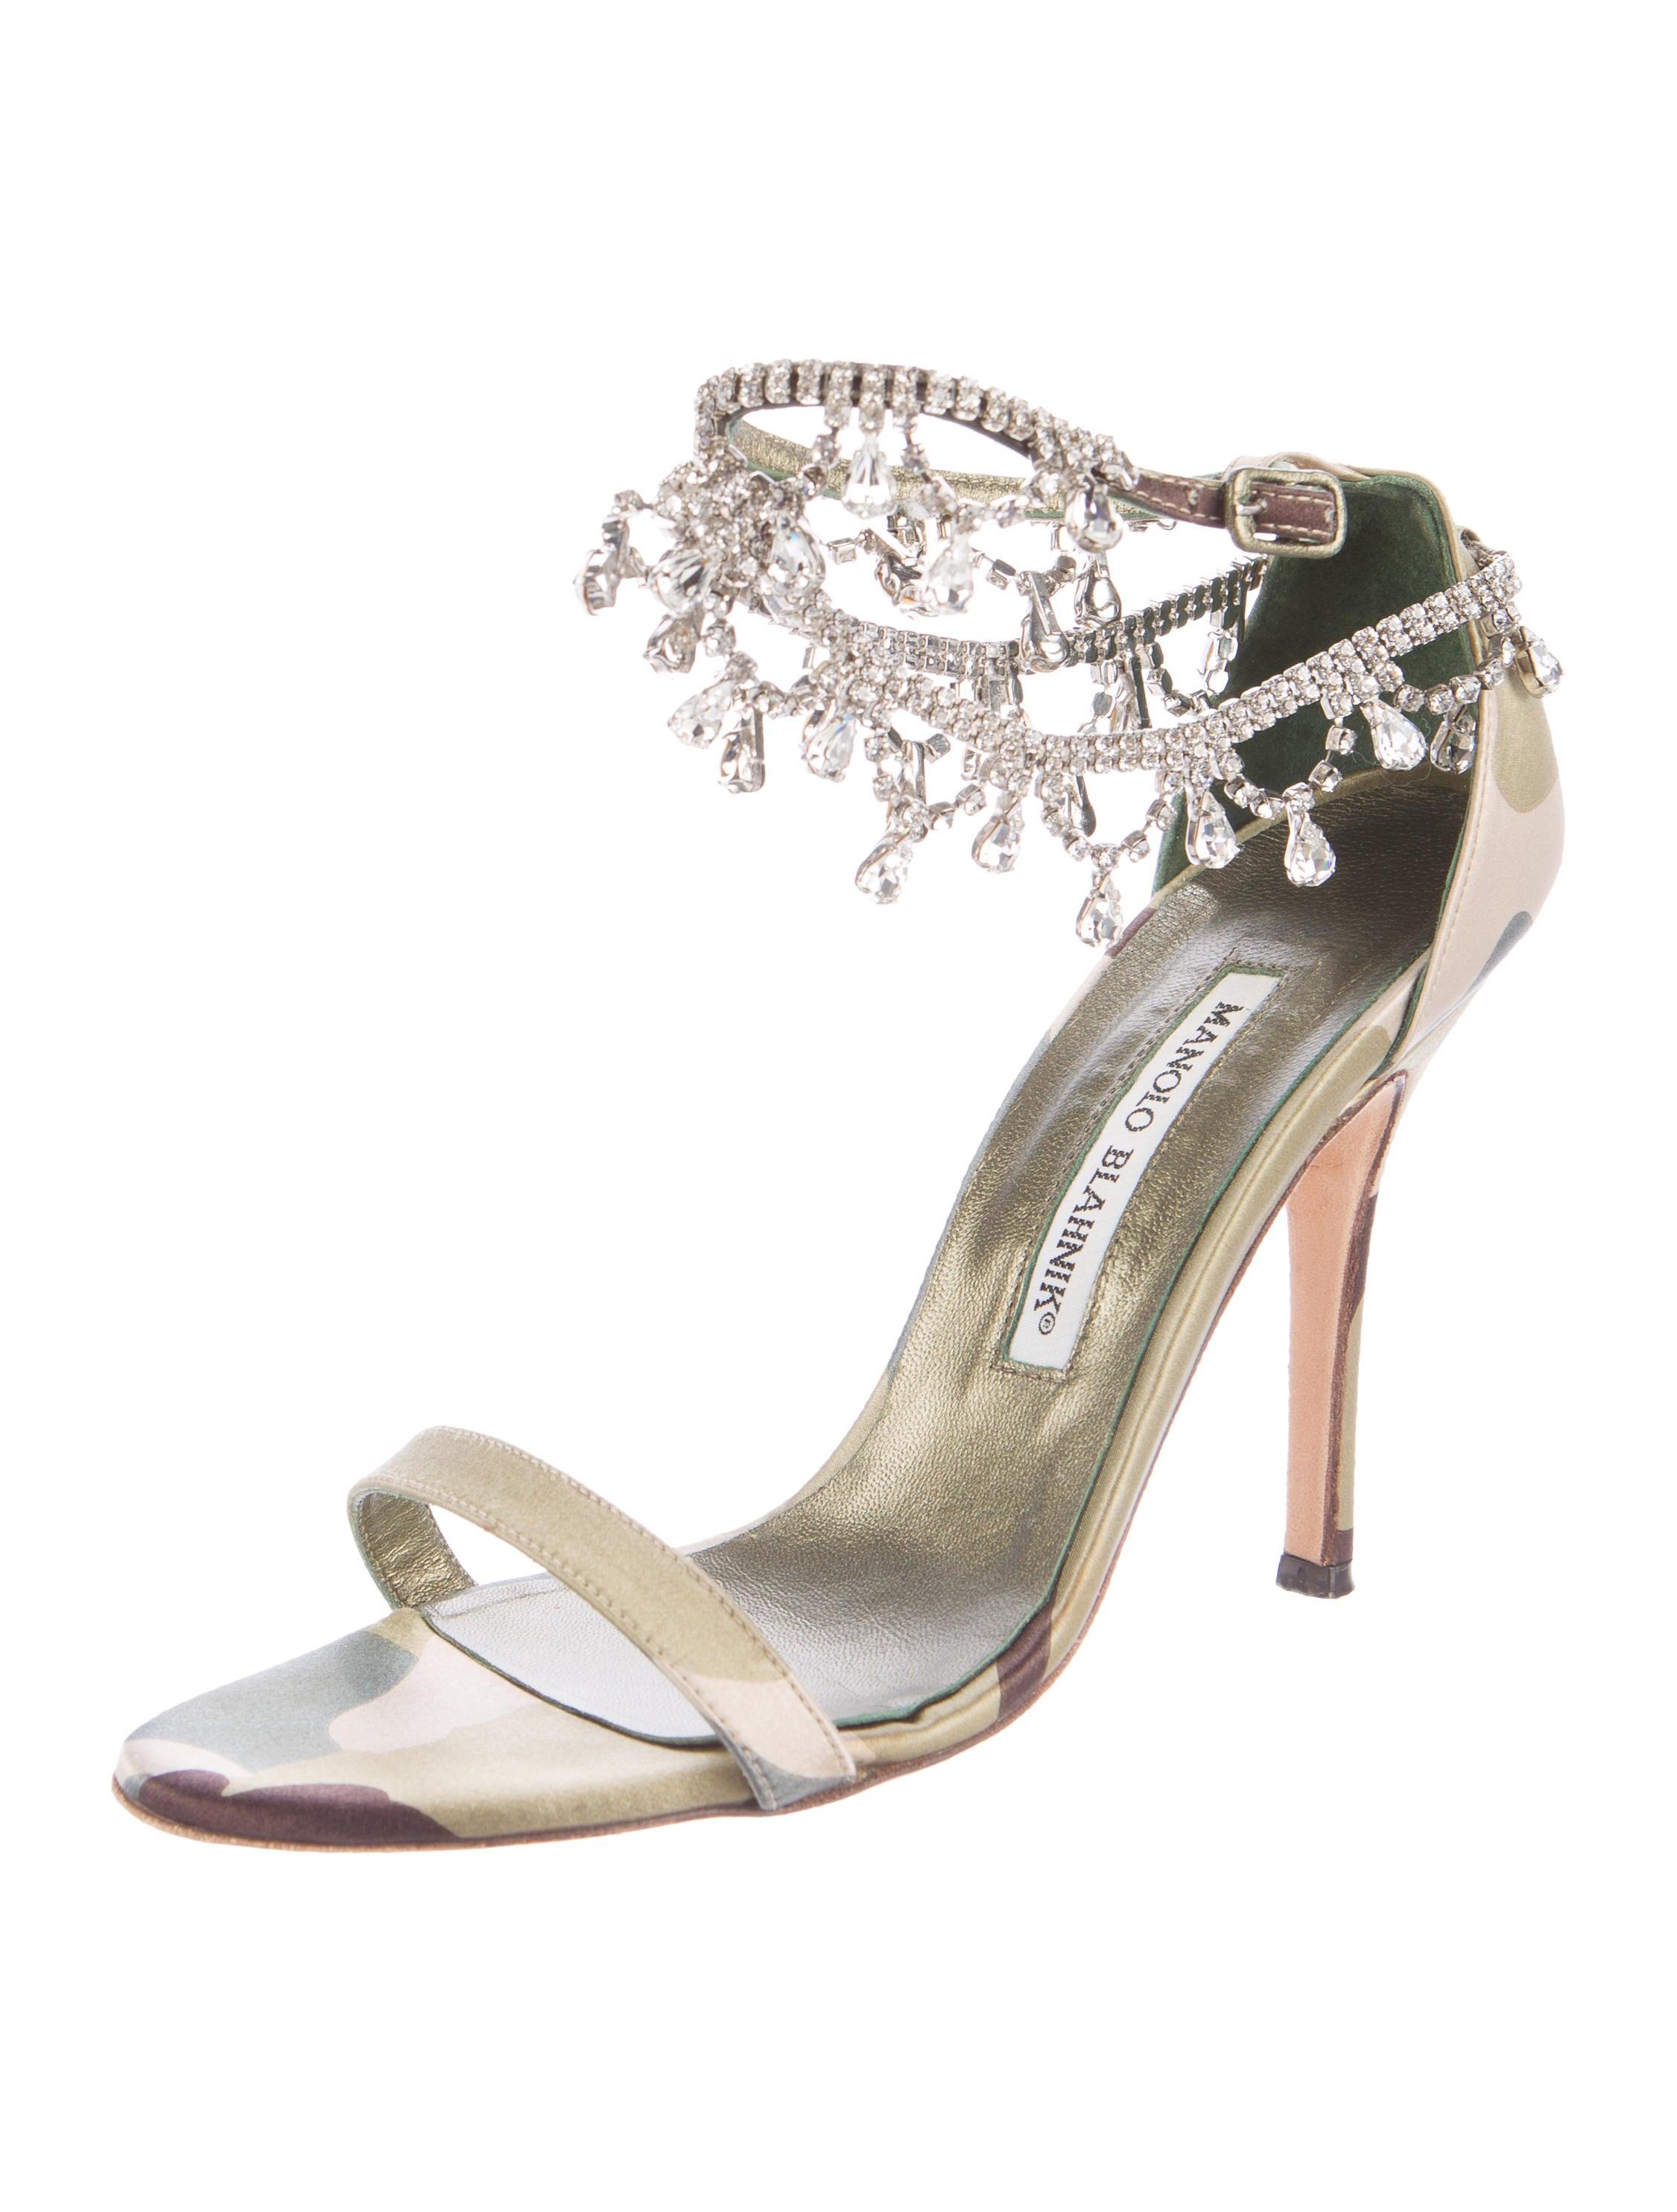 Manolo Blahnik Manolo Blahnik Camo Hourista Sandals order sale online HSXpHoj